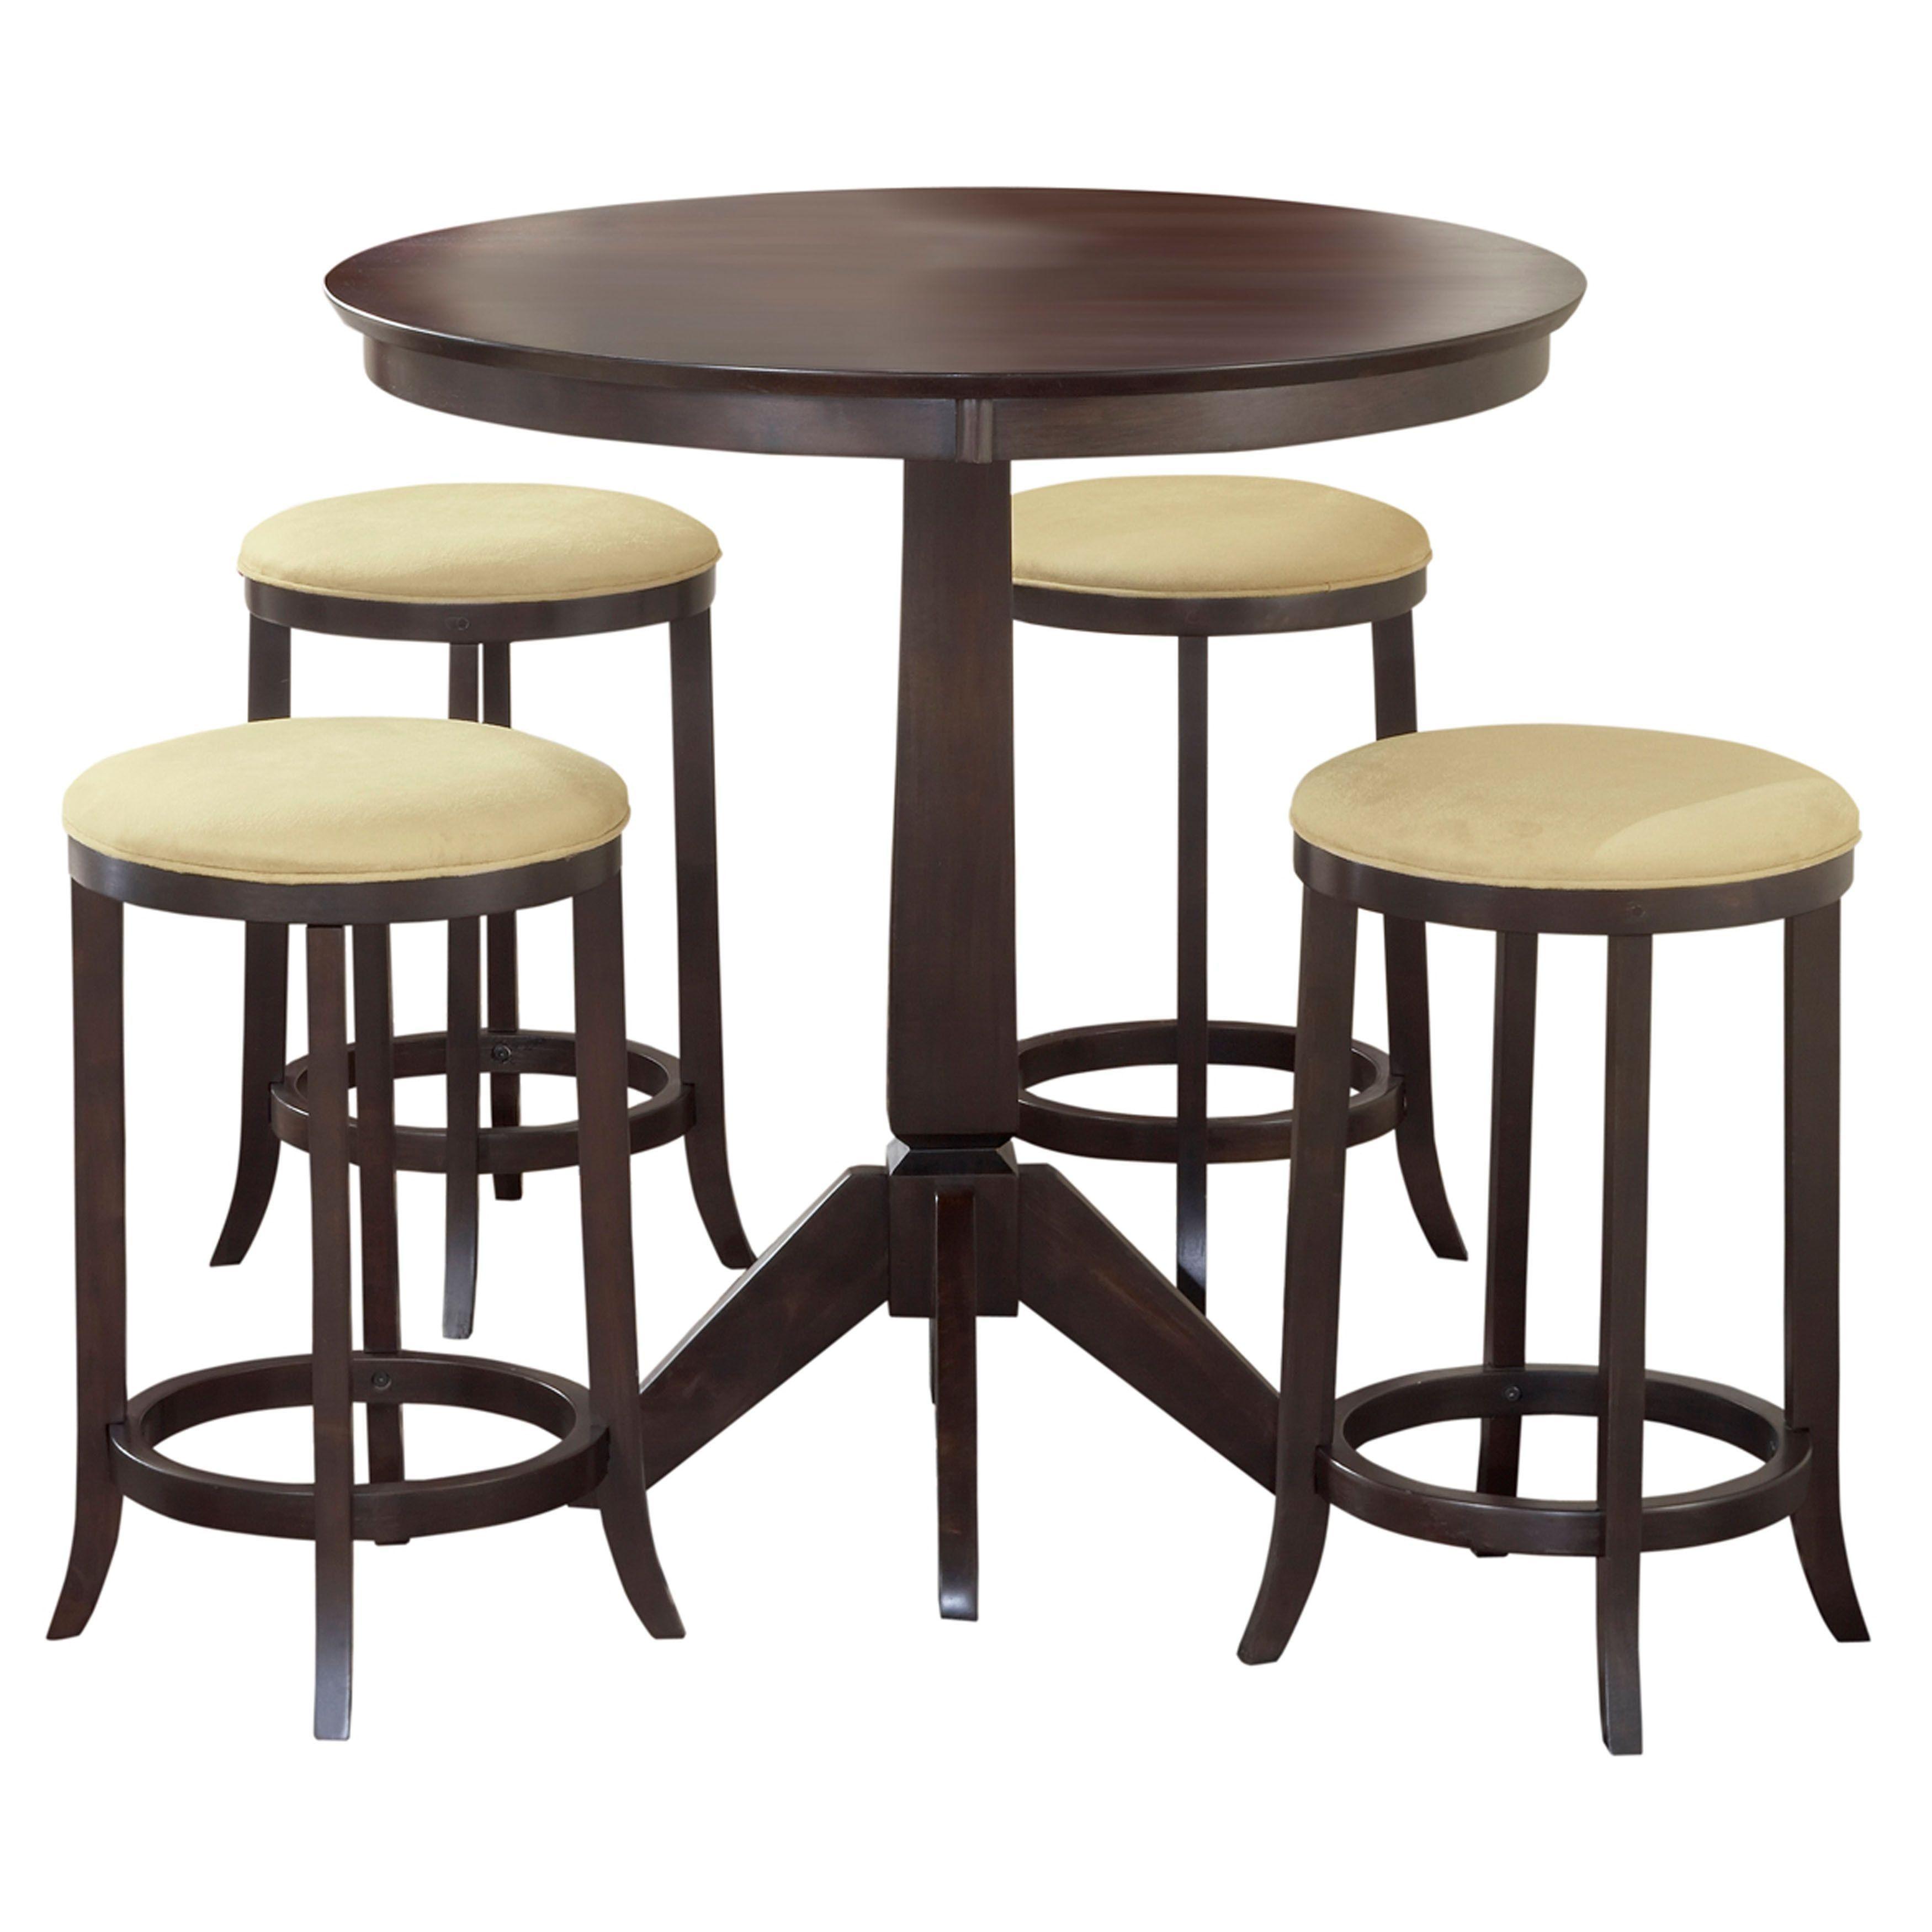 Hillsdale Furniture Tiburon Espresso Finish Wood Pub Table